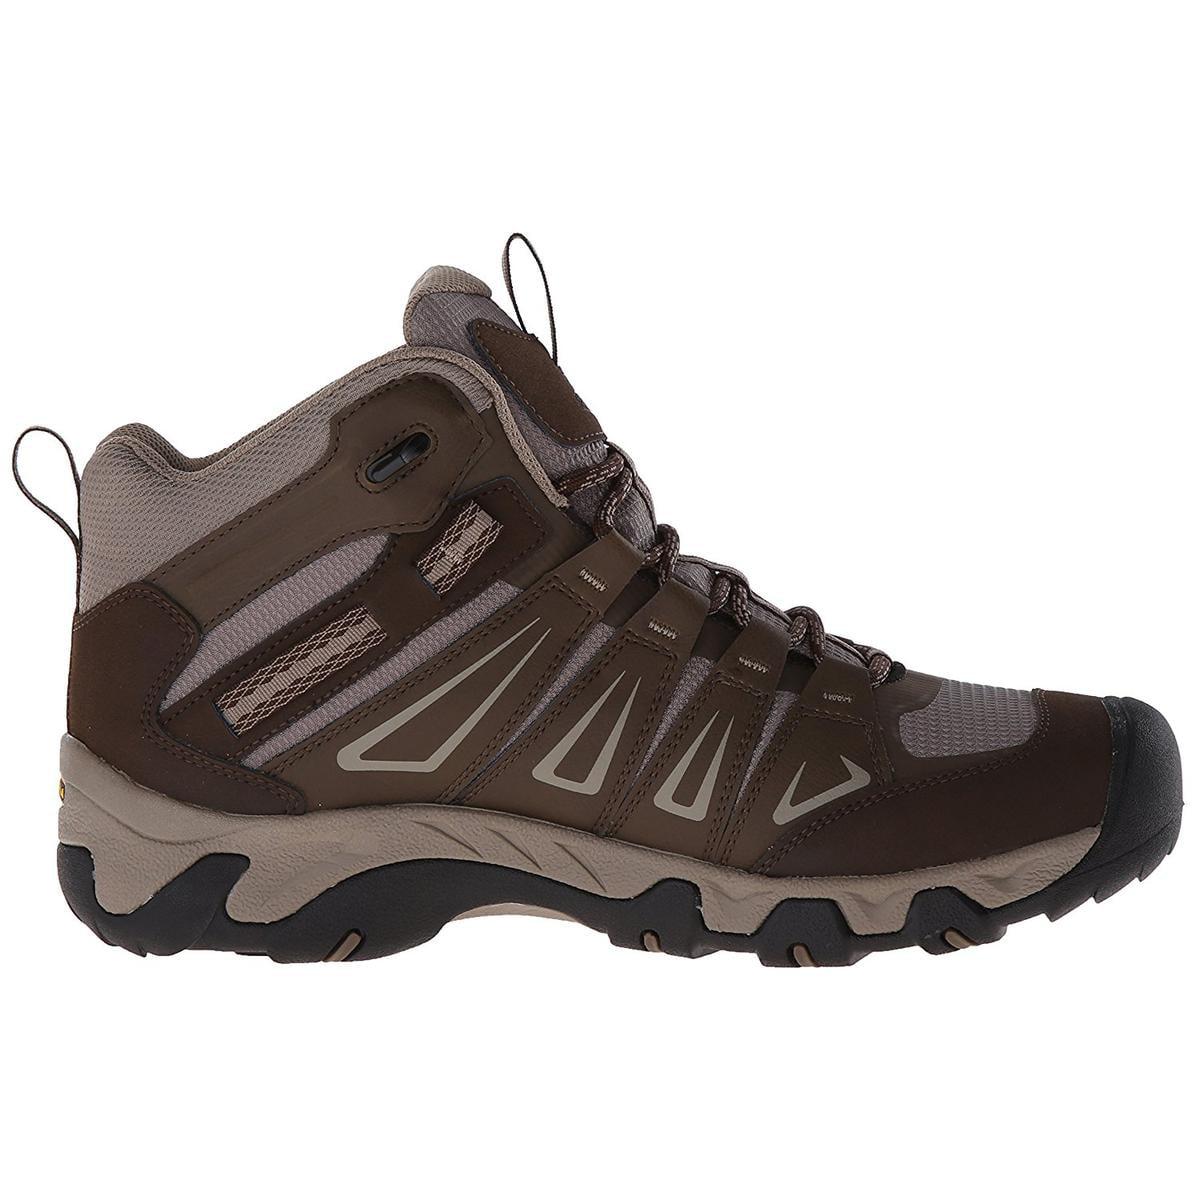 KEEN Oakridge Mid WP Mens Cascade/Brindle Sneakers